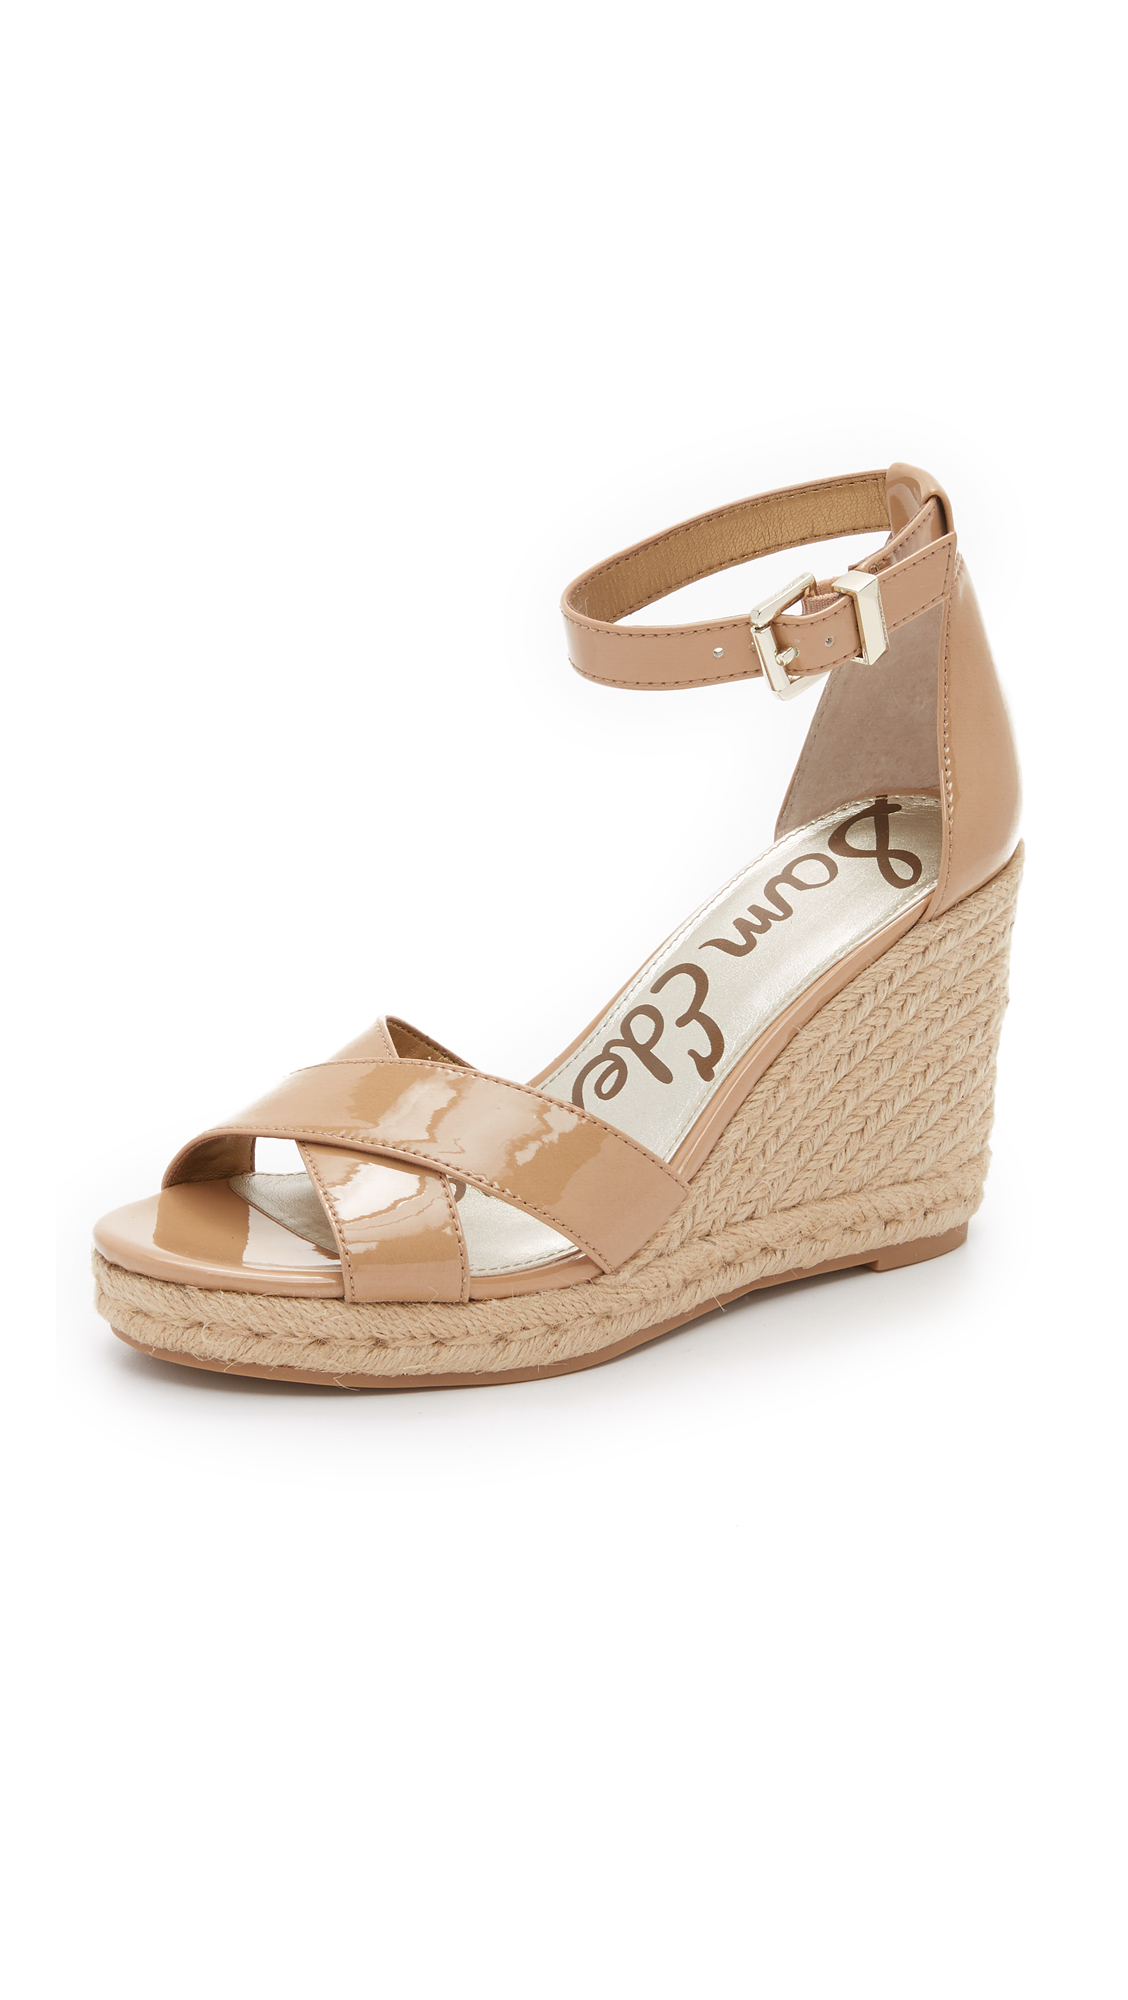 ec8cad046a9 Sam Edelman Natural Brenda Espadrille Wedge Sandals